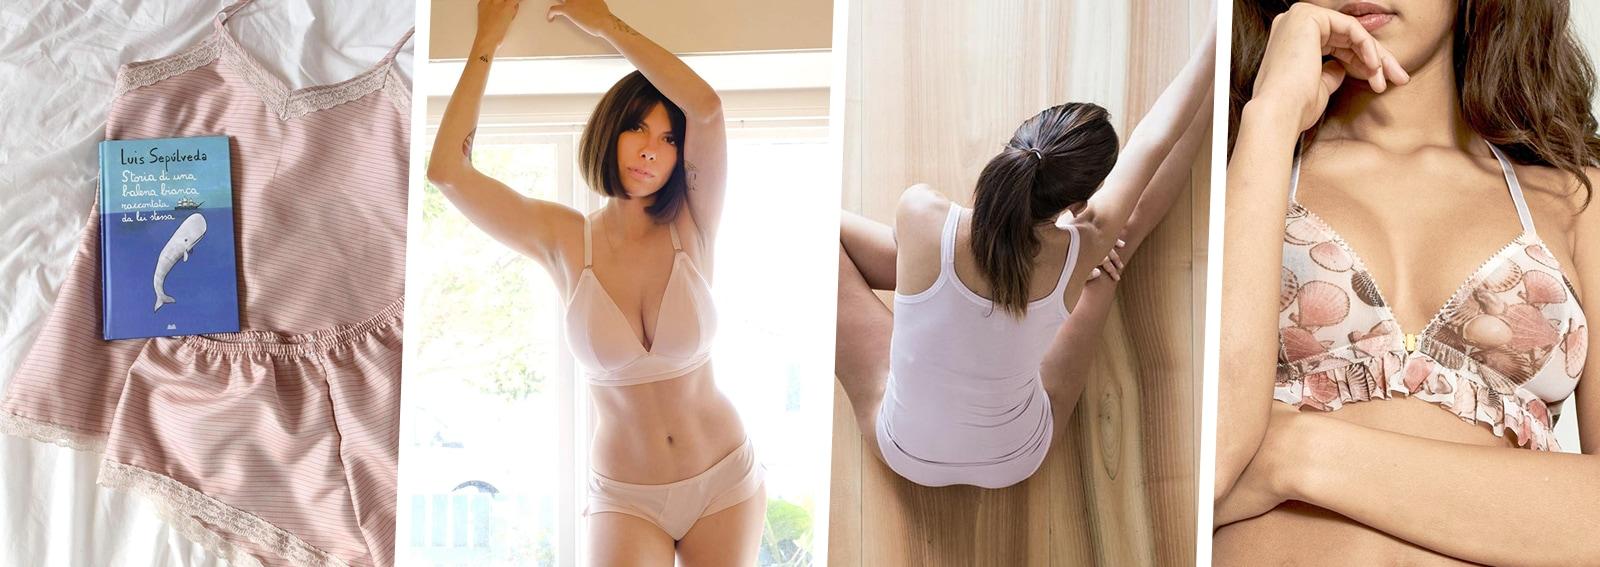 DESKTOP_lingerie_sostenibile